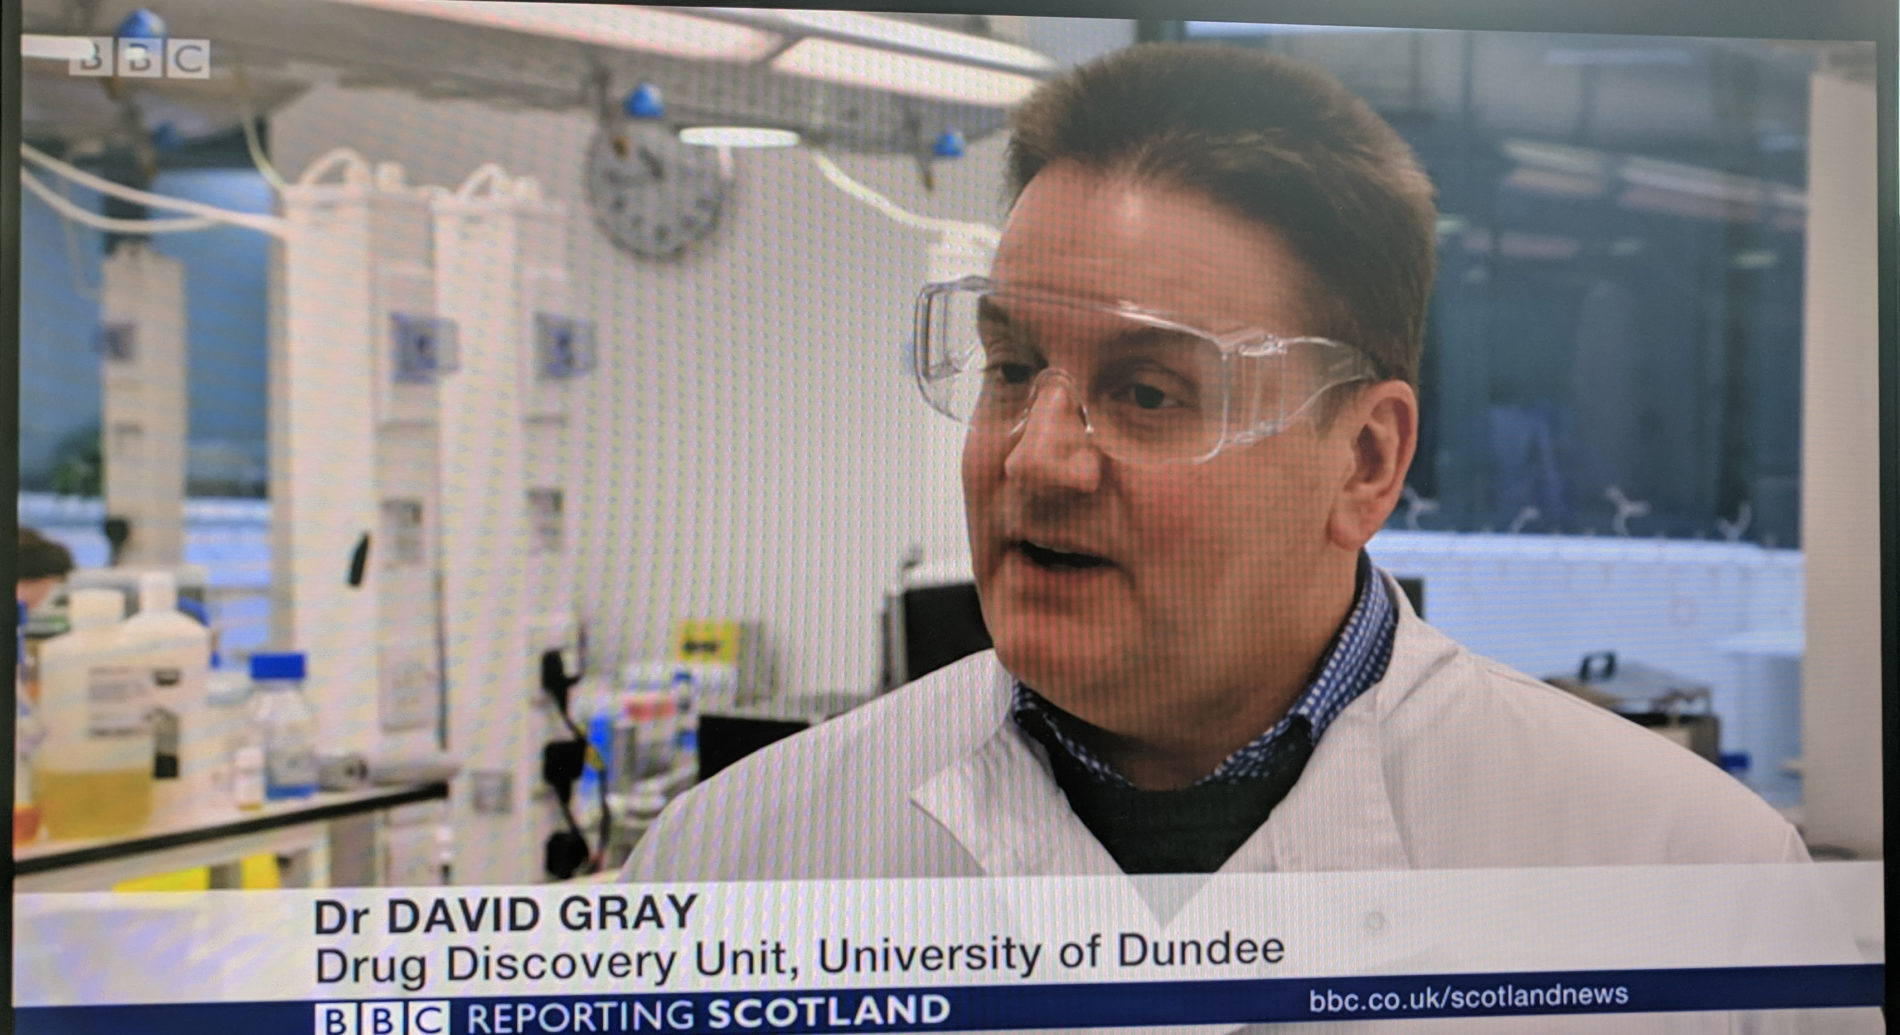 Screenshot of David Gray on BBC News